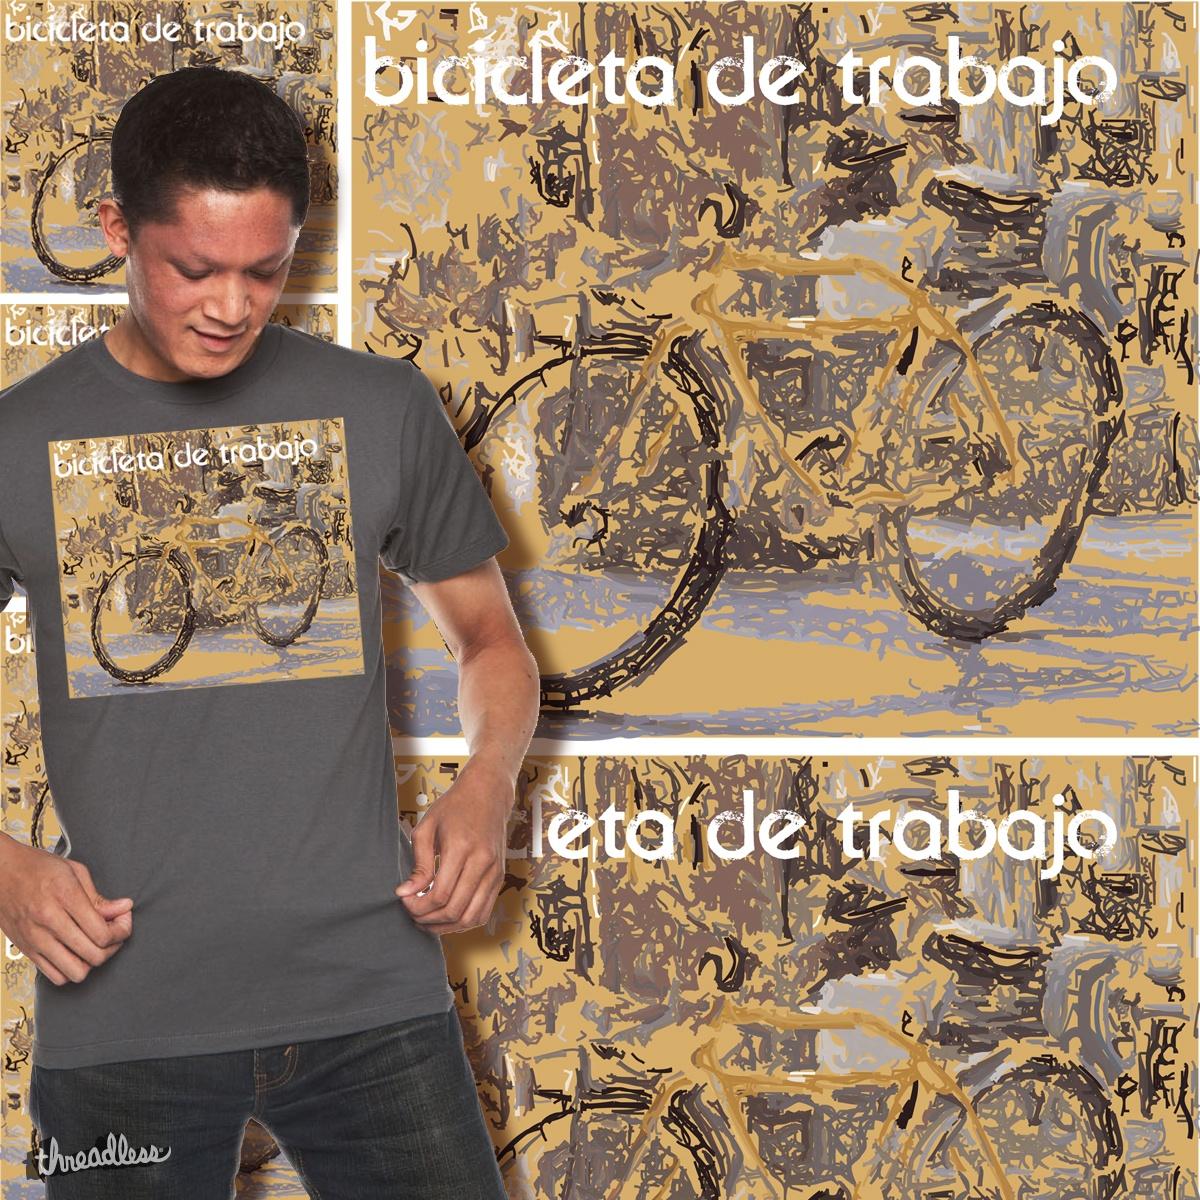 Bicicleta de Trabajo (Working Bicycle), a cool t-shirt design